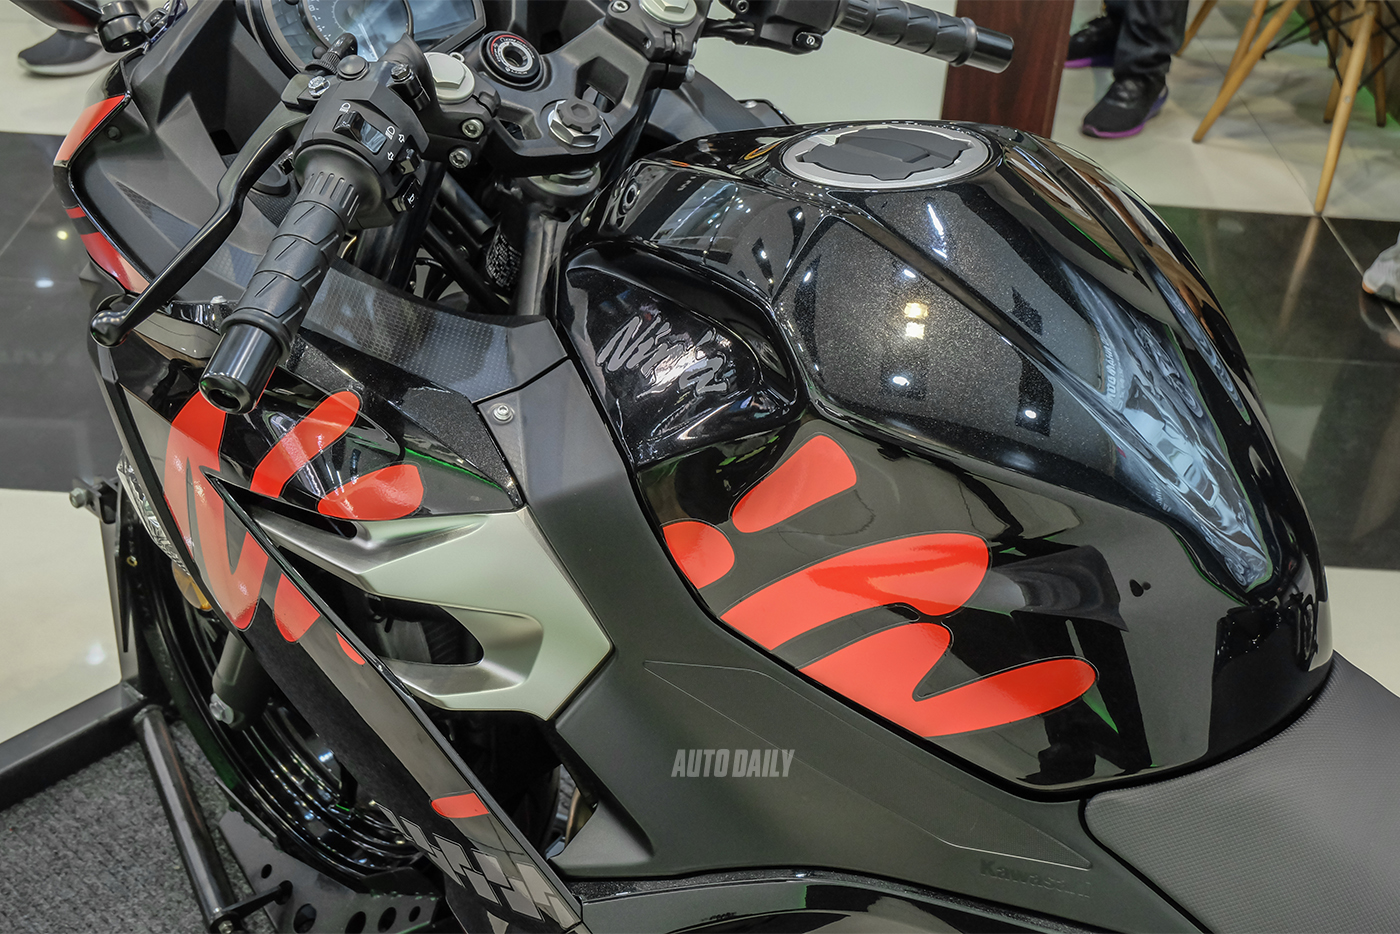 kawasaki-ninja-400-19.jpg